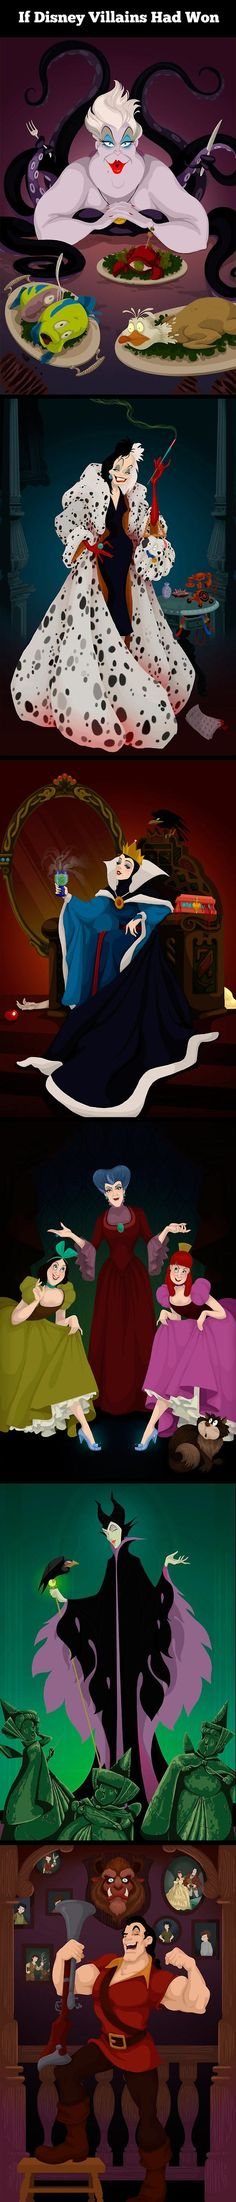 If Disney villains had won…